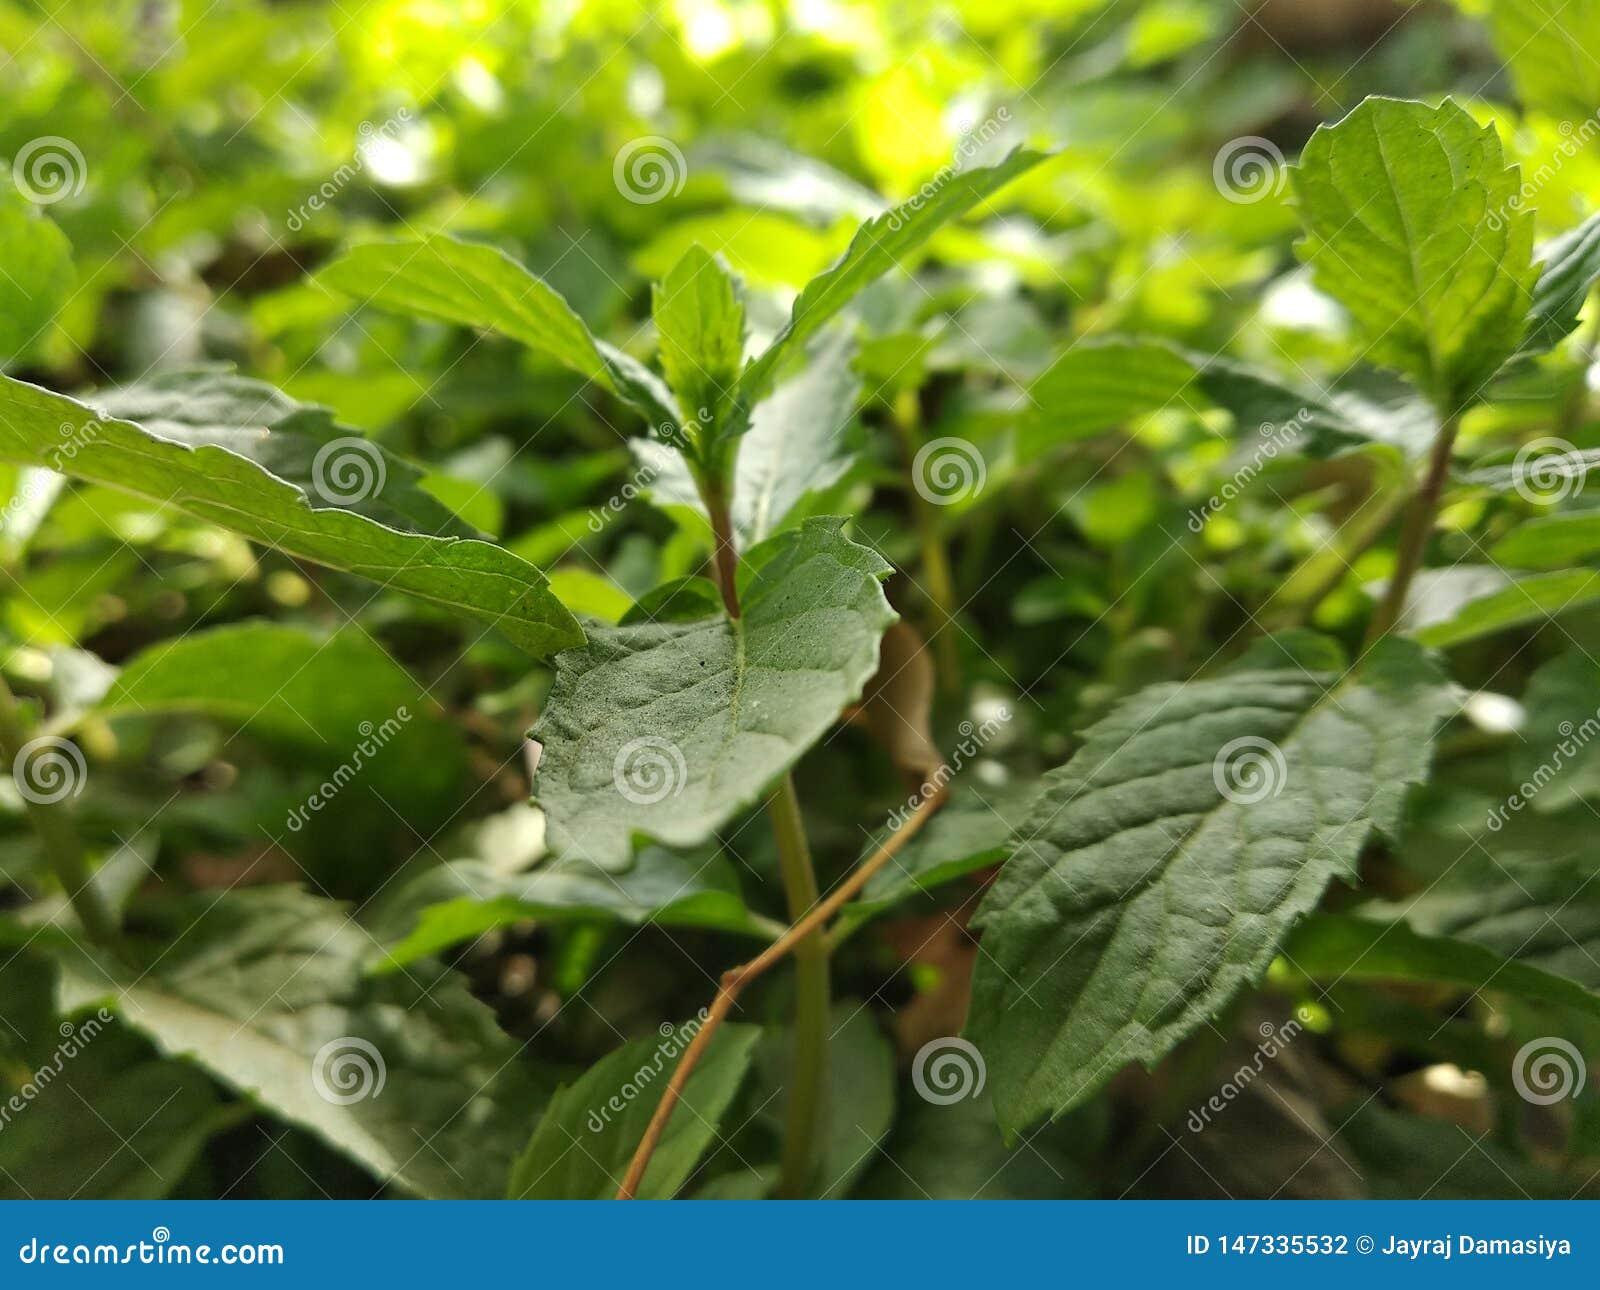 Mint : Benifit,risk,diet and nutrition